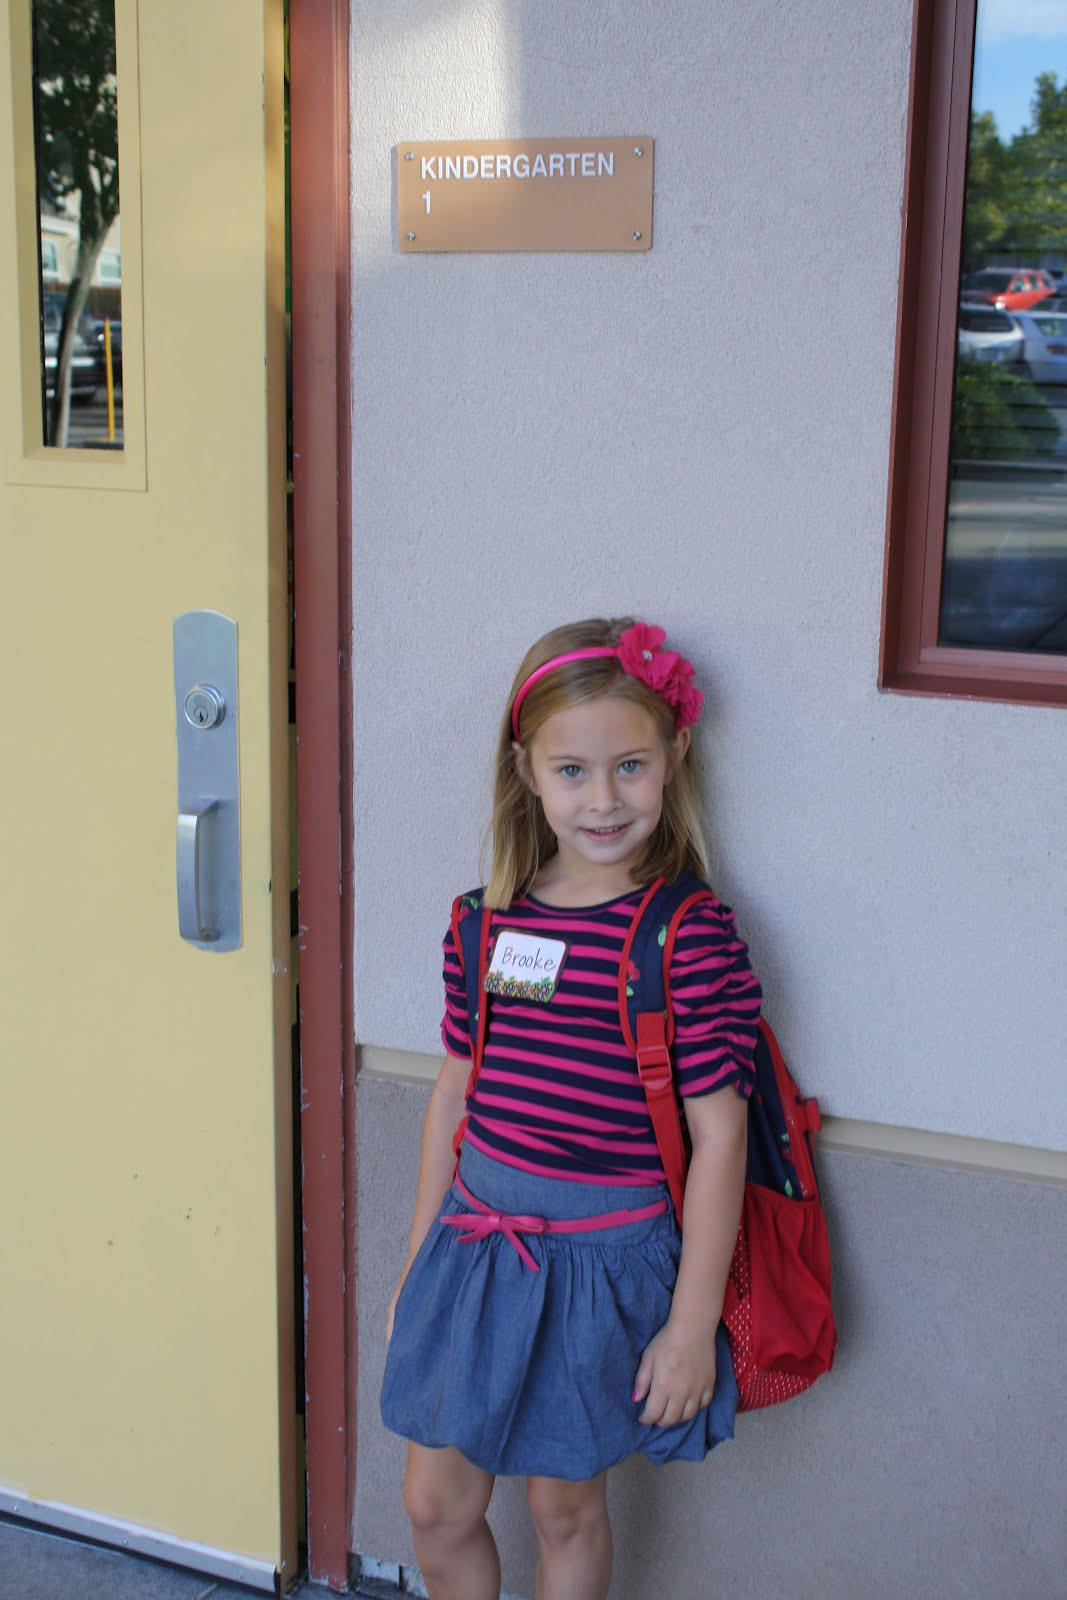 Kinder Garden: The Seffens Family Blog: First Day Of Kindergarten